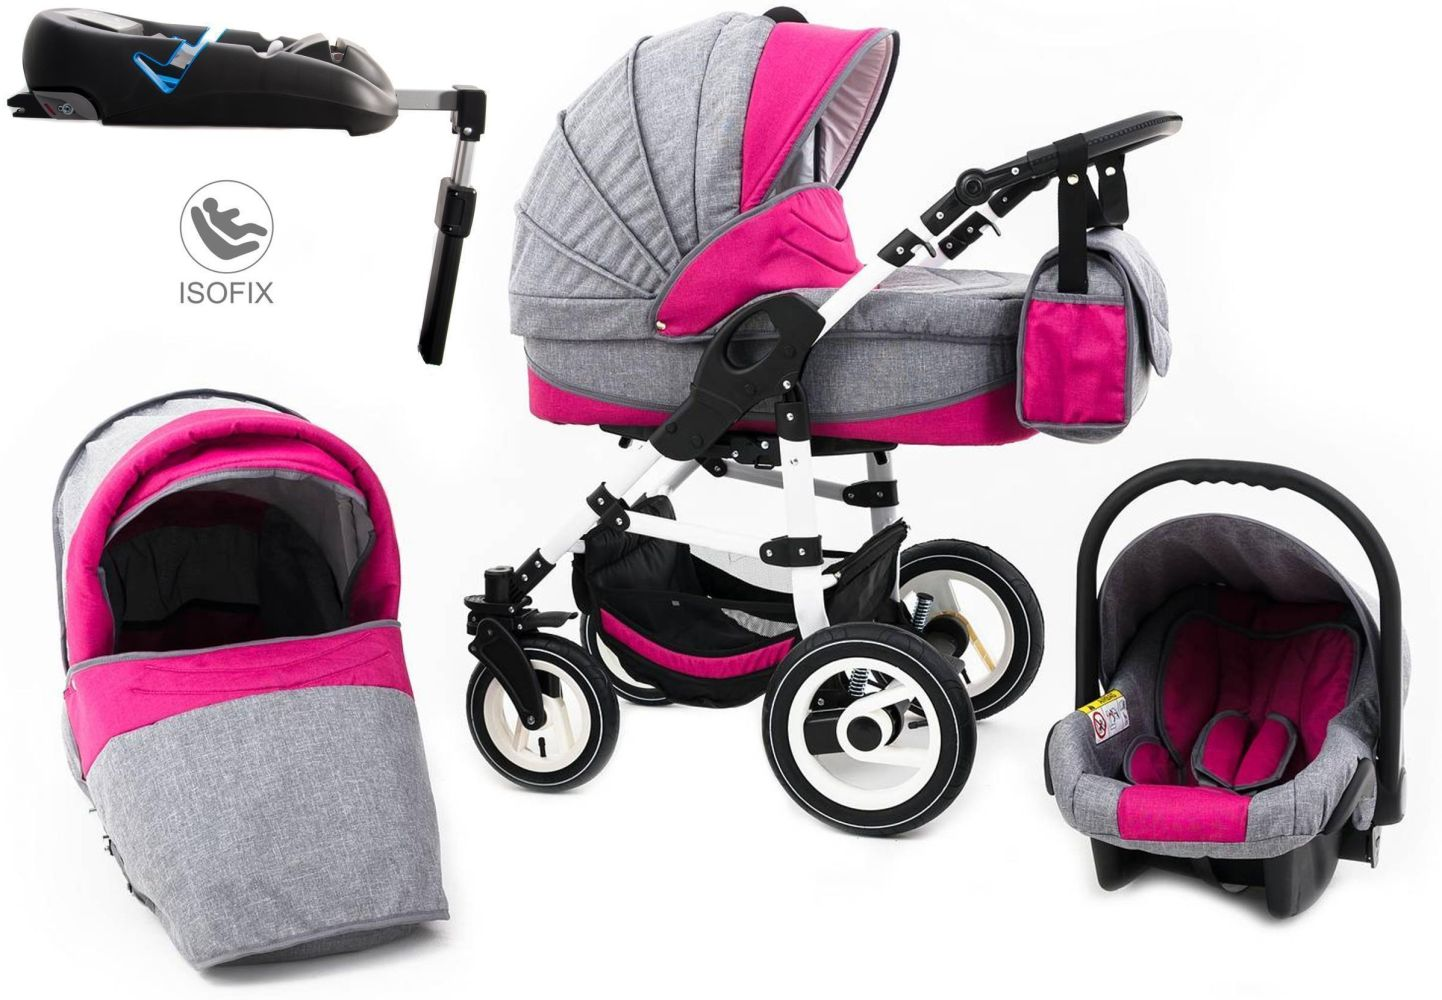 Tabbi ECO LN | 4 in 1 Kombi Kinderwagen | Hartgummireifen | Farbe: Pink Bild 1